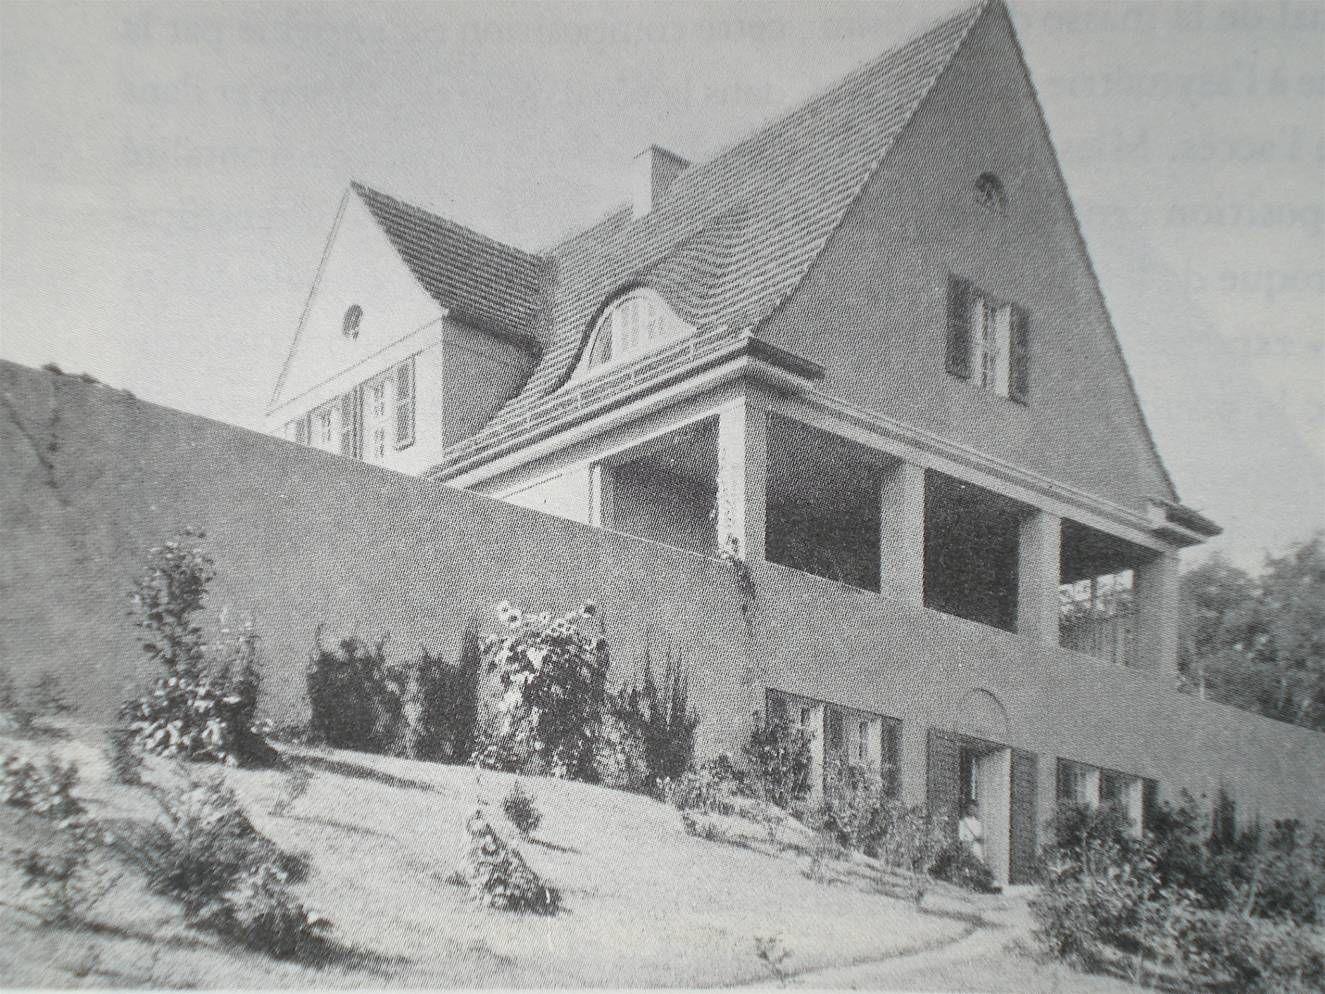 l mies van der rohe maison alois riehl berlin 1907 allemagne 1900 pinterest ludwig mies. Black Bedroom Furniture Sets. Home Design Ideas